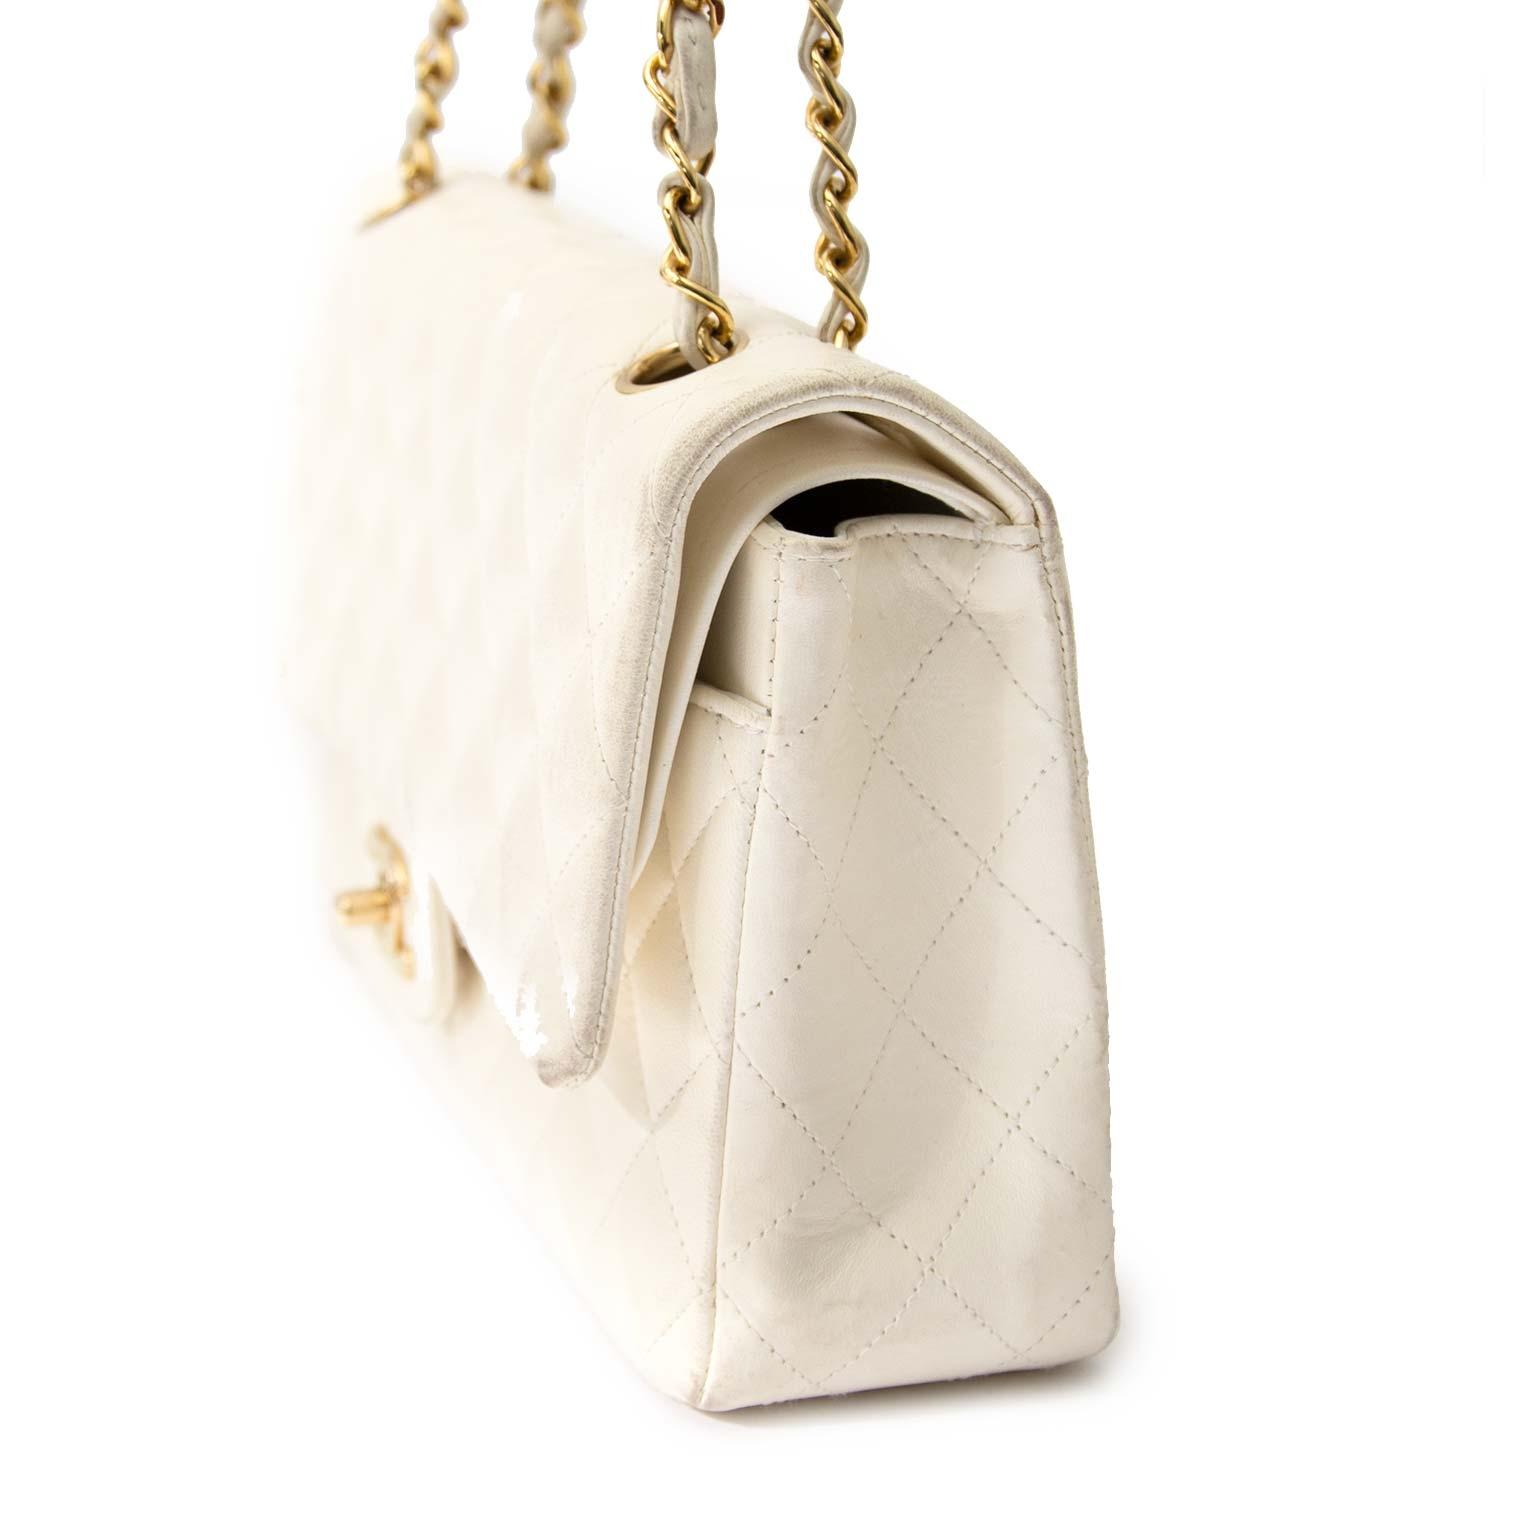 Chanel White Lambskin Medium Classic Double Flap Bag shop online Chanel White Lambskin Medium Classic Double Flap Bag